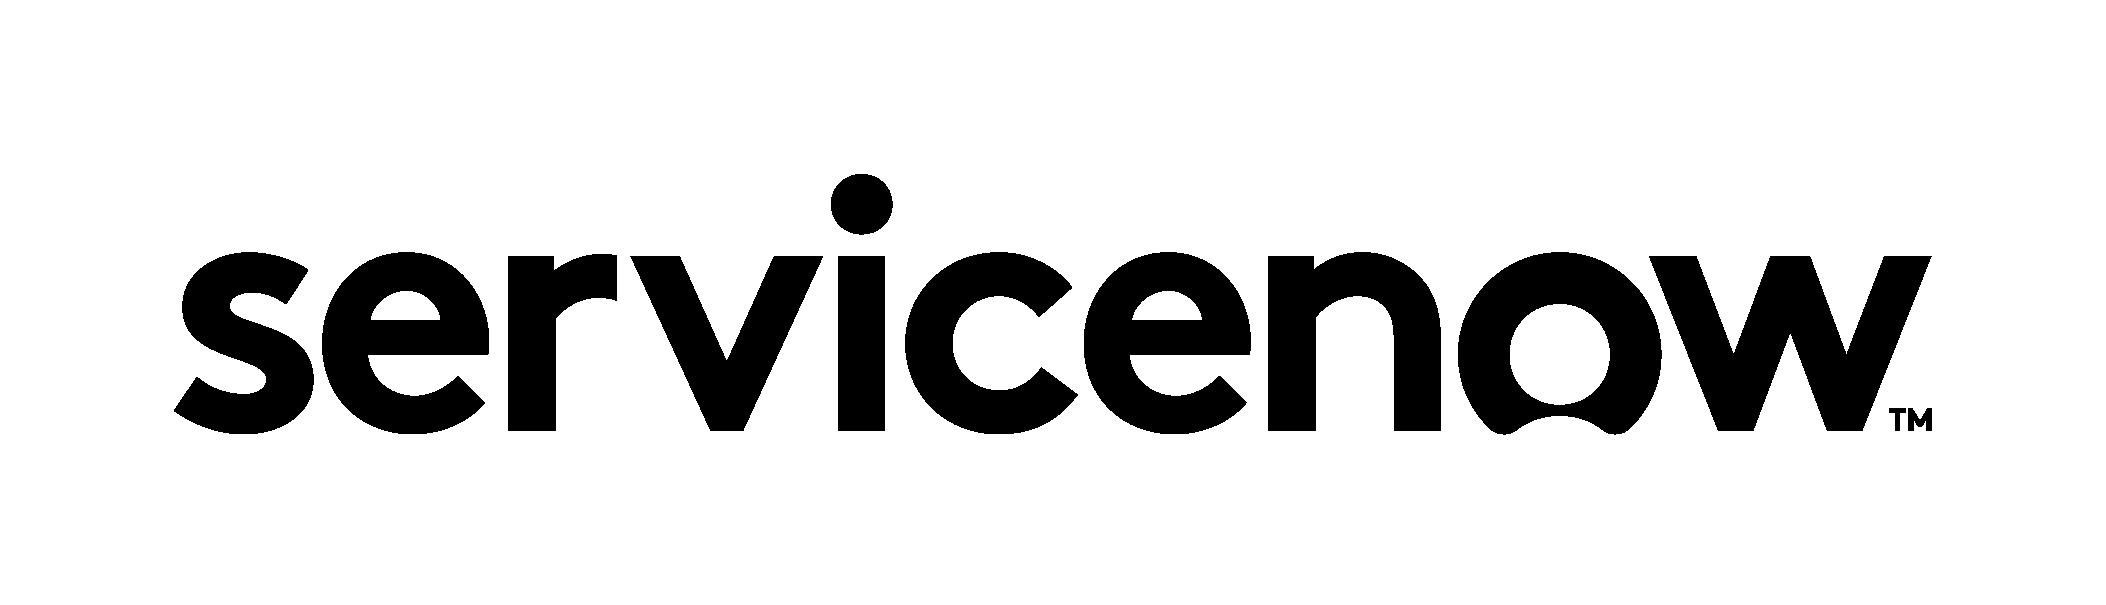 ServiceNow_logo_RGB_600dpi_BL